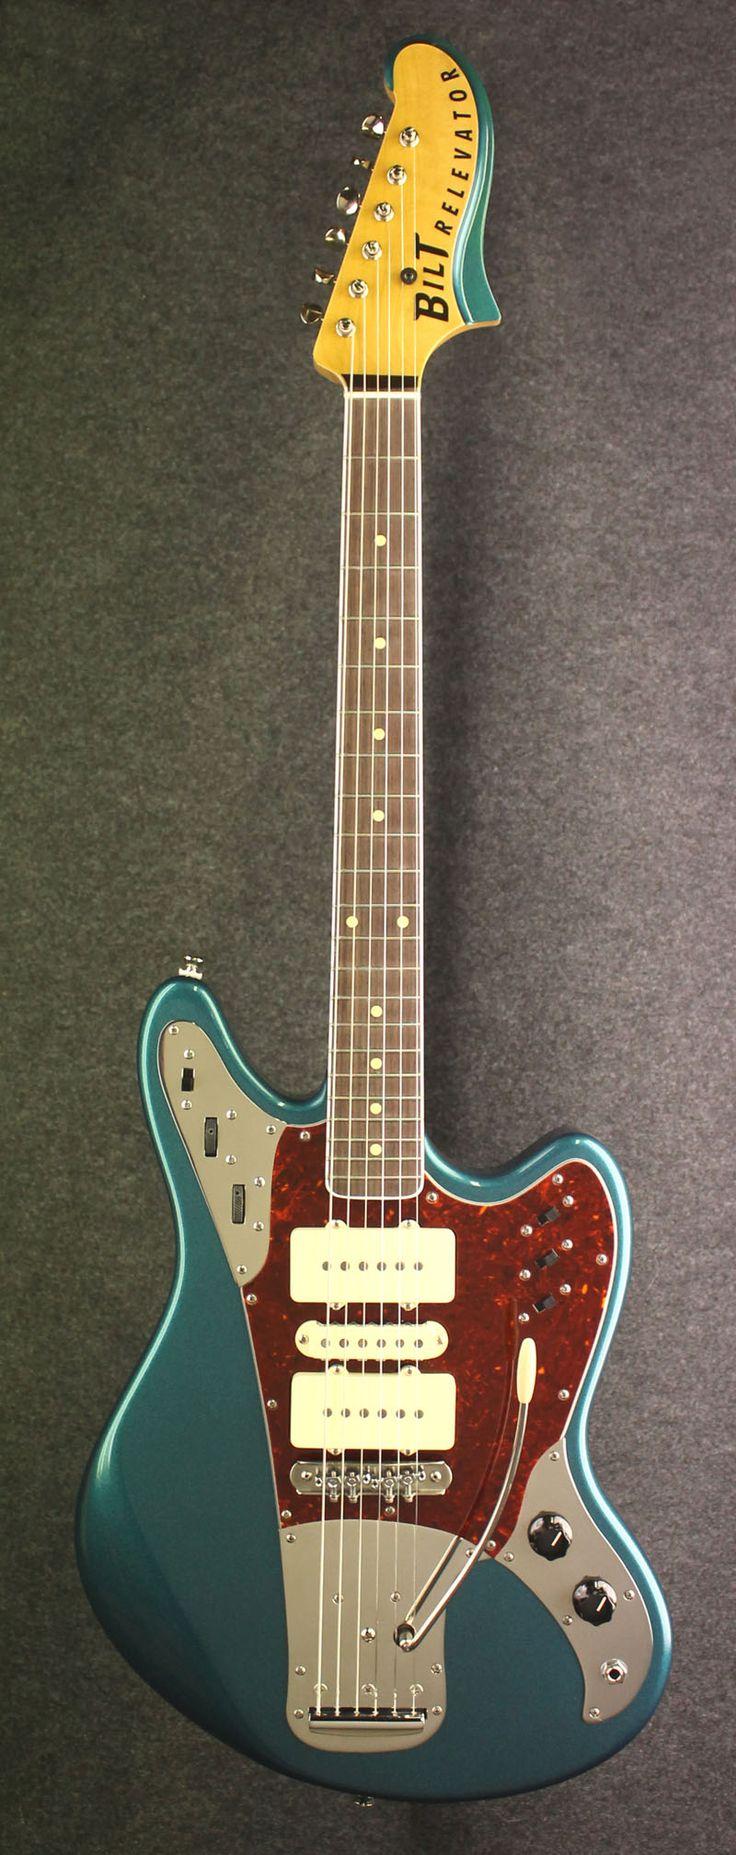 the relevator LS model guitar built by Bilt Guitars :: BilT Guitars - Des Moines, Iowa